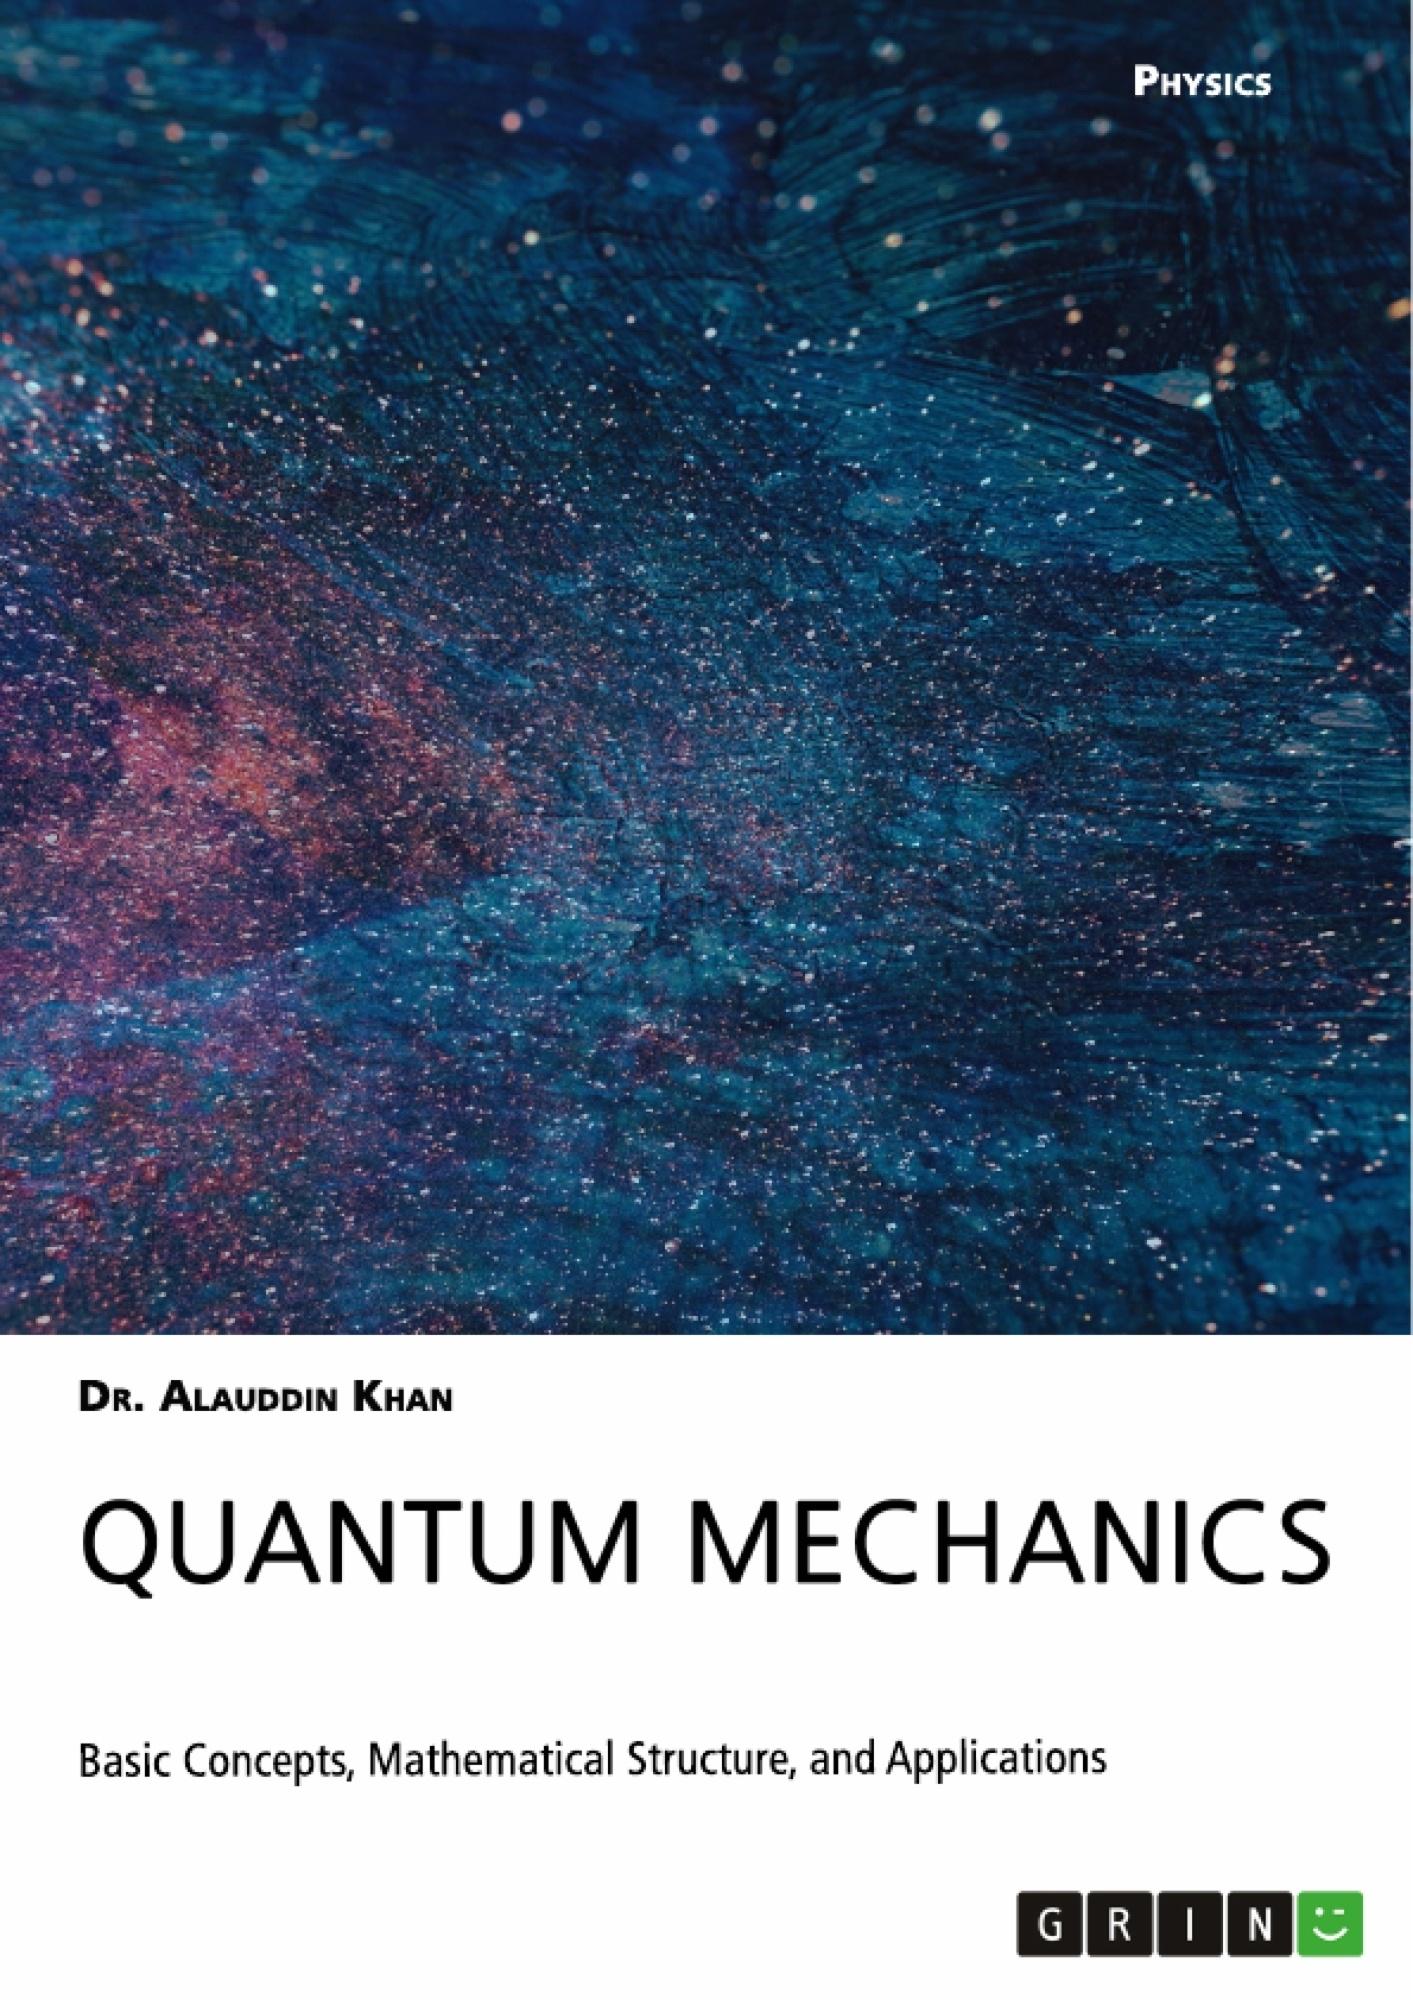 Title: Quantum Mechanics. Basic Concepts, Mathematical Structure and Applications